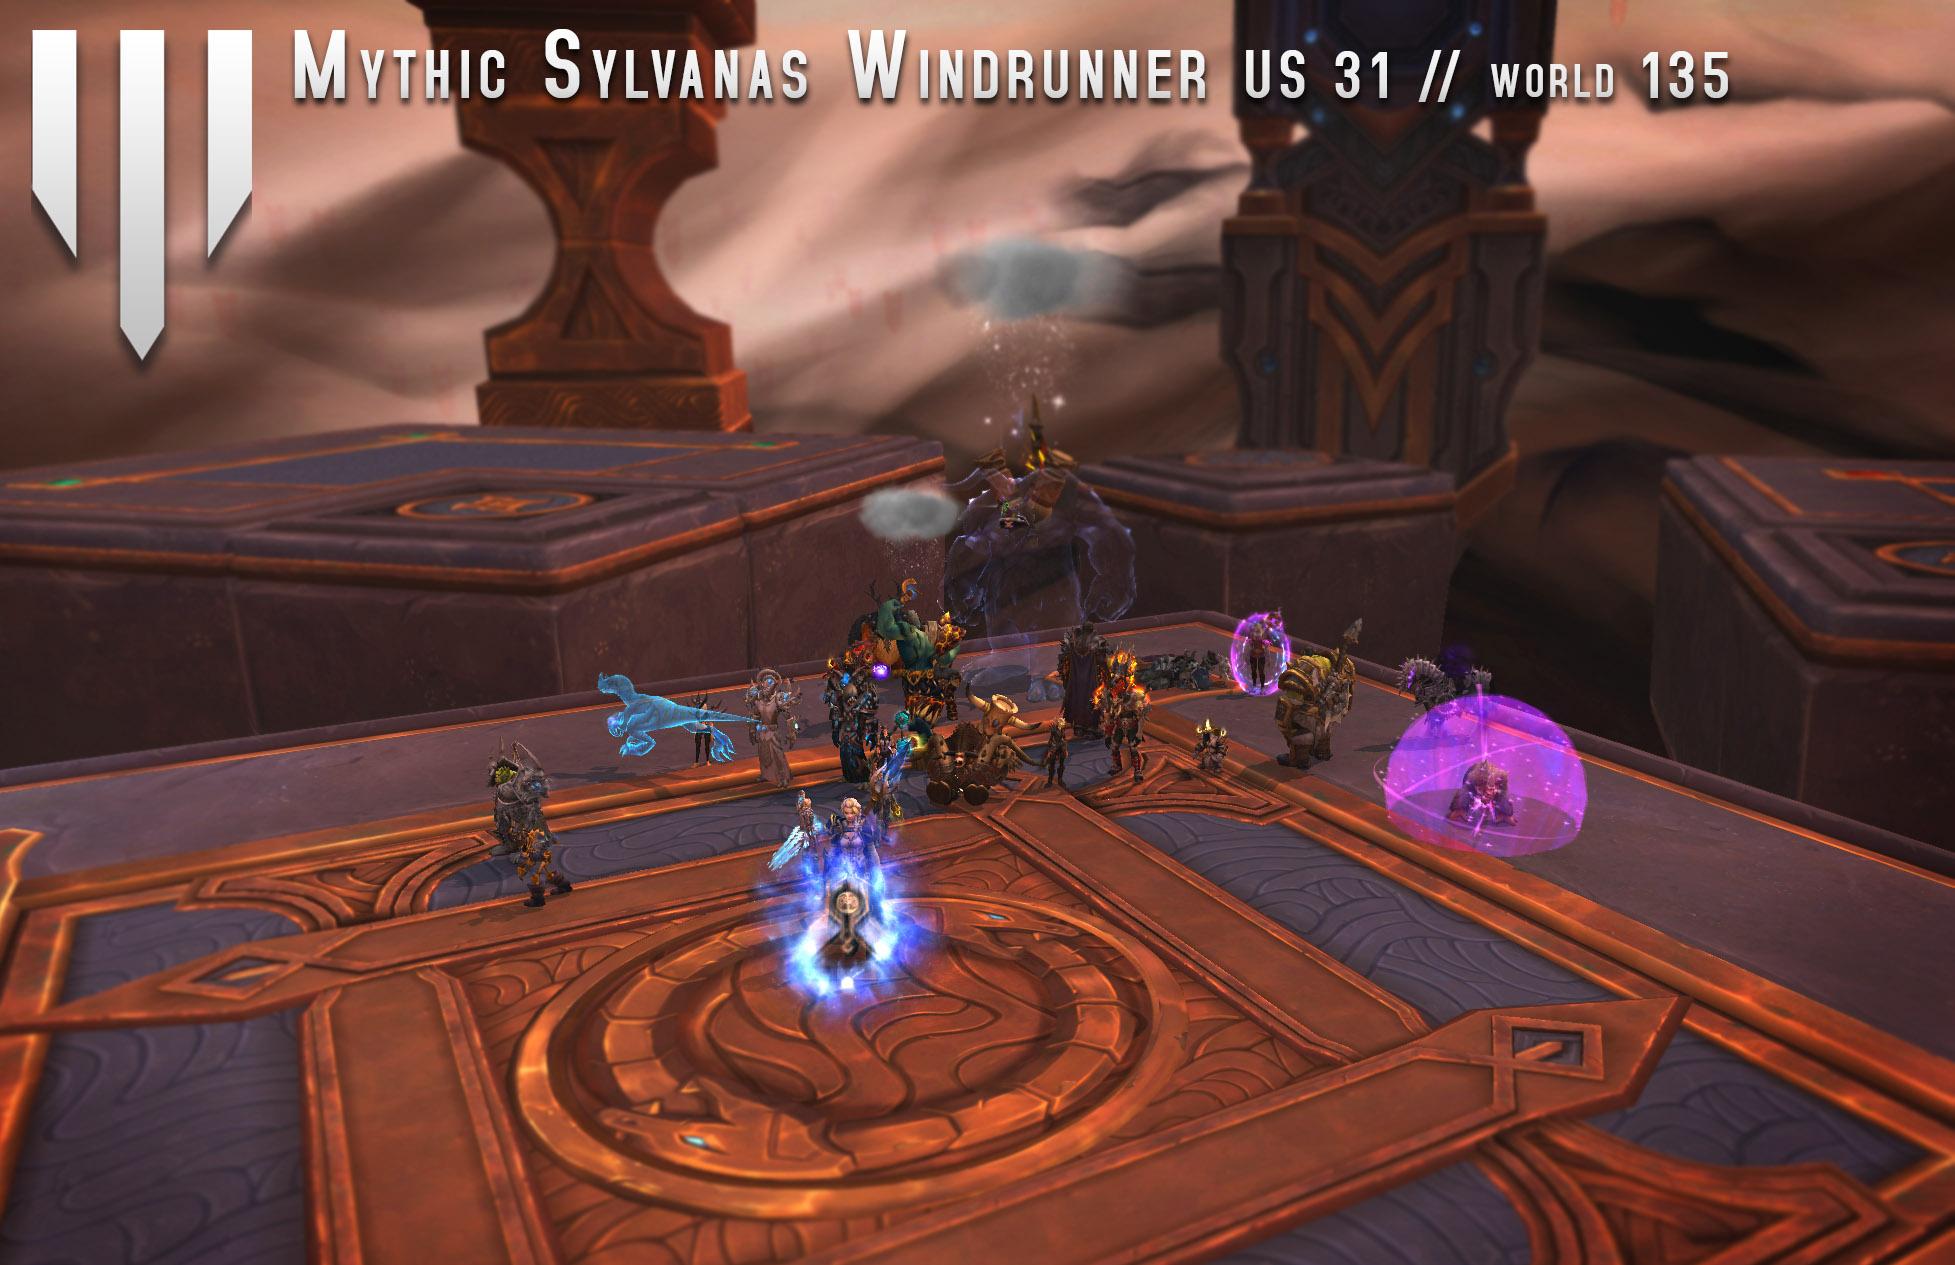 Might Mythic Sylvanas Windrunner